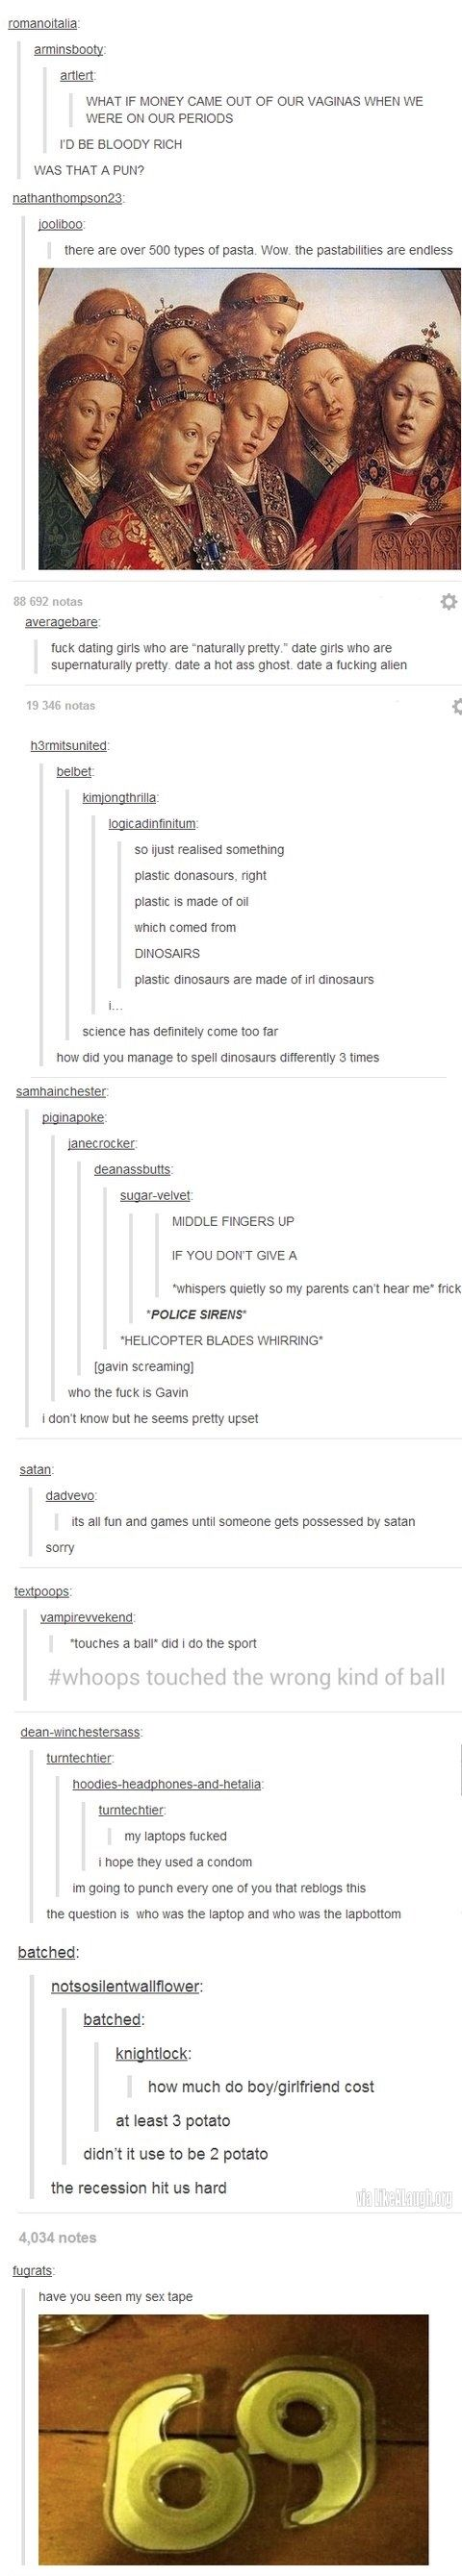 I always repin tumblr silliness